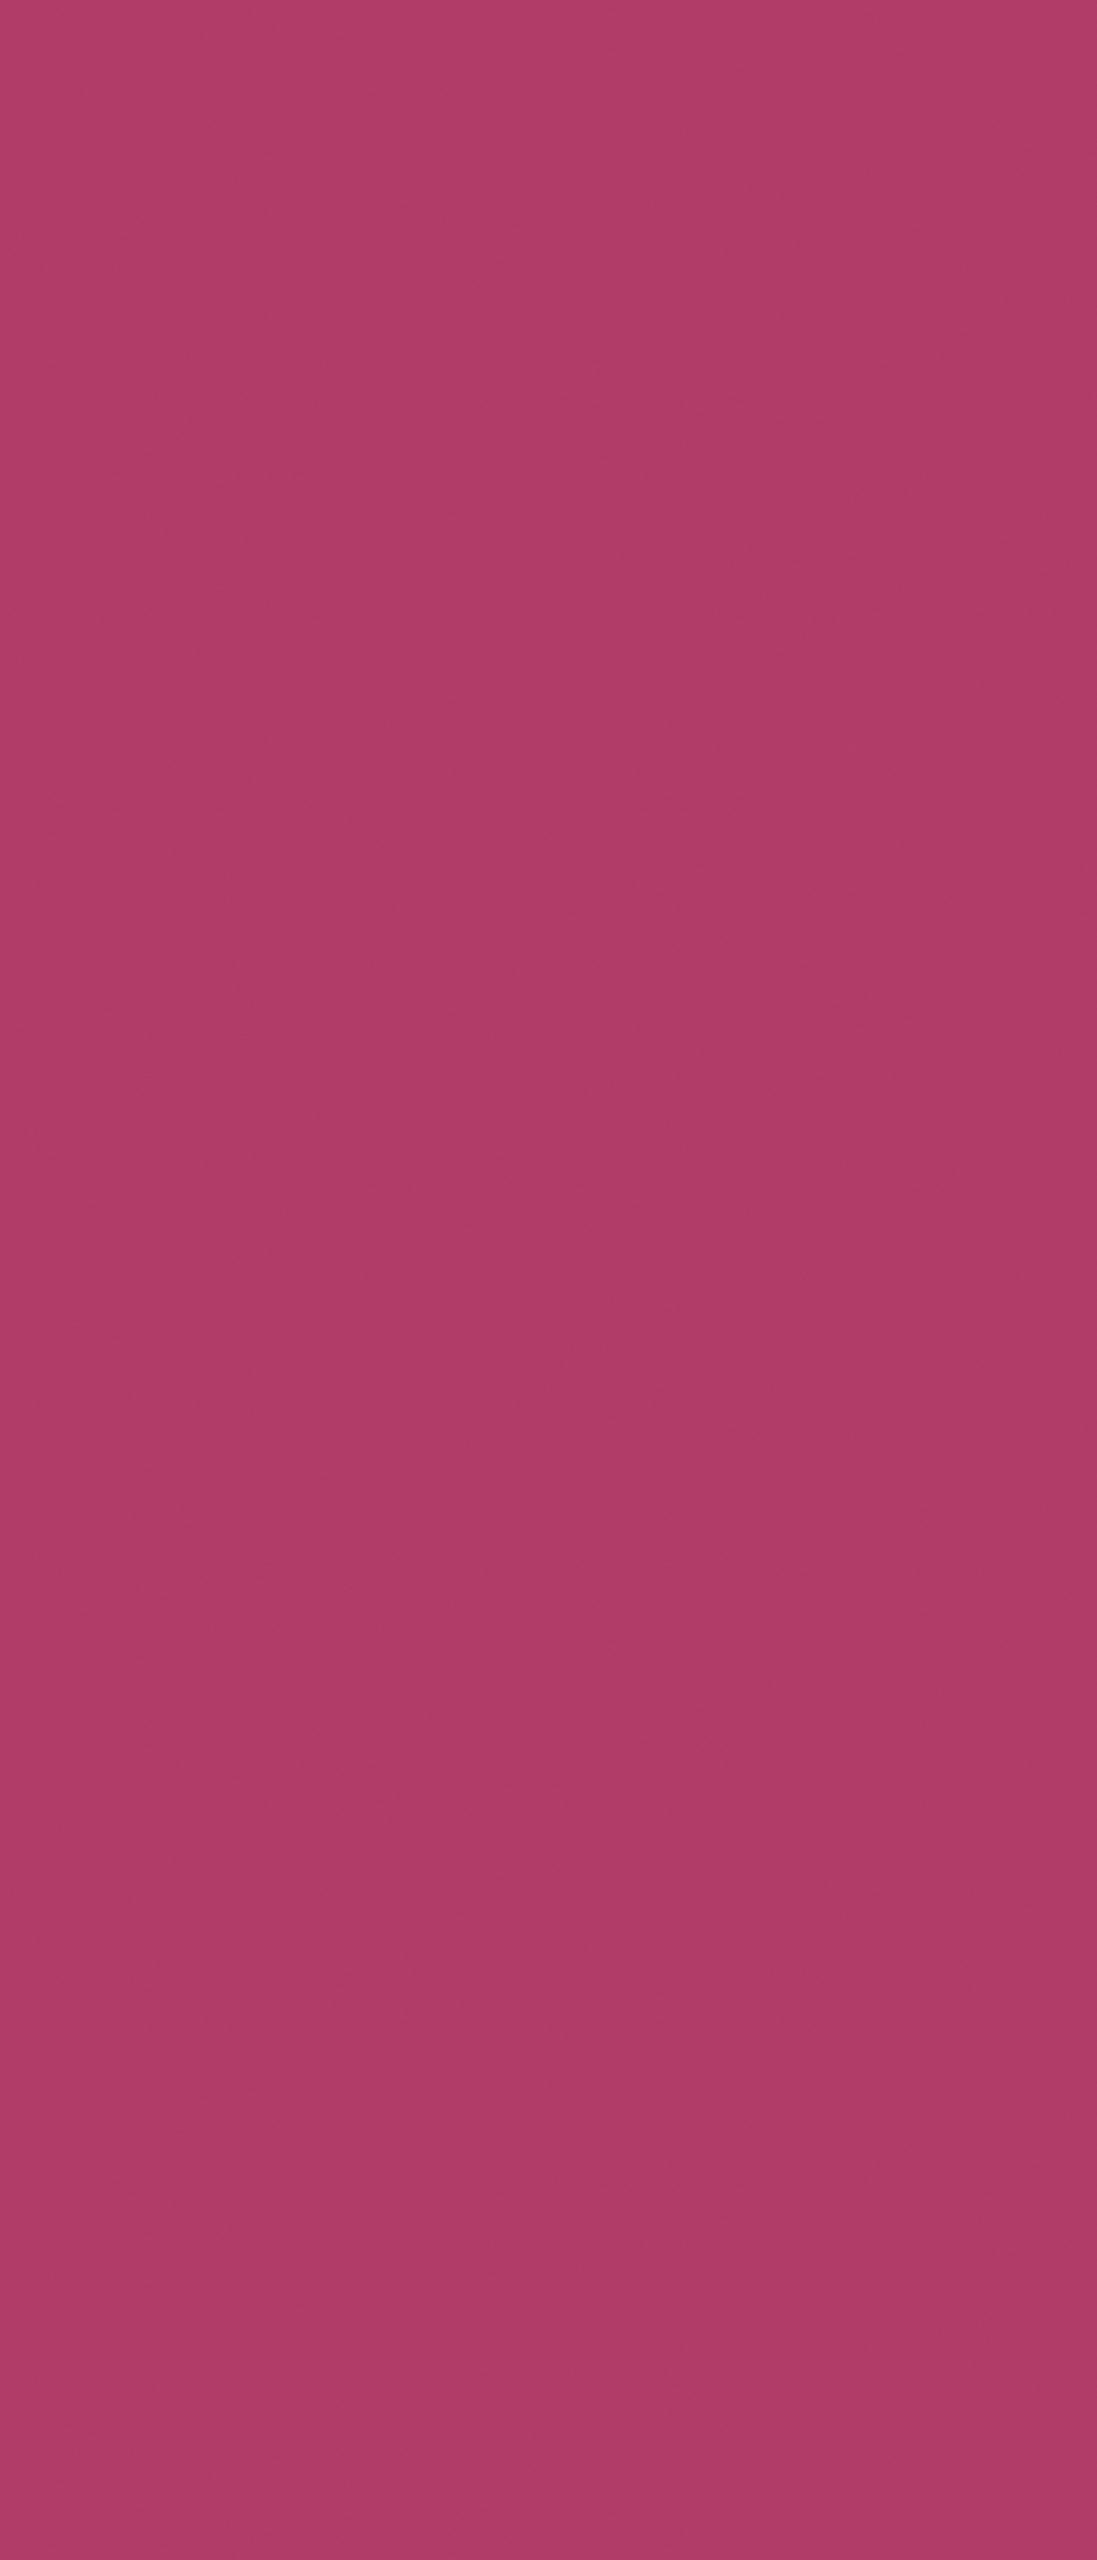 Buildtech 2.0 Bold Colors Fuchsia Glossy 6mm 120 x 280